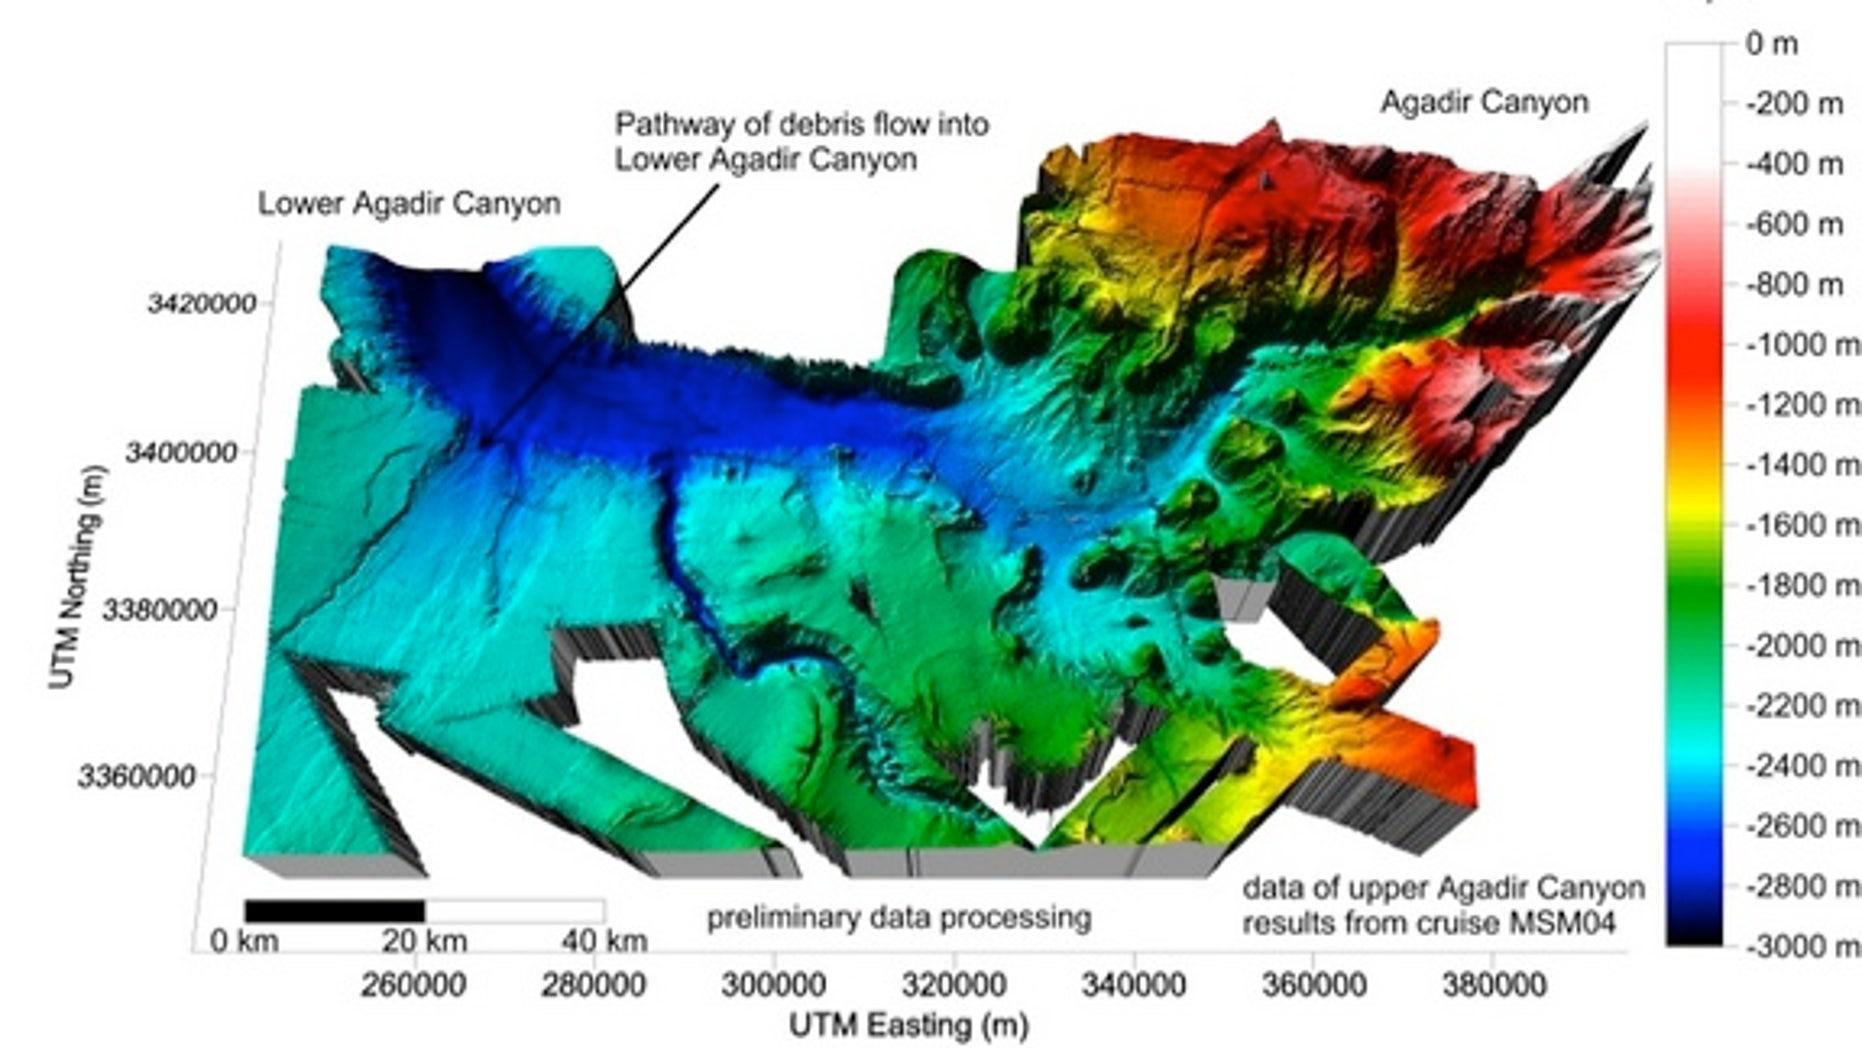 3D seafloor bathymetry map of upper Agadir Canyon